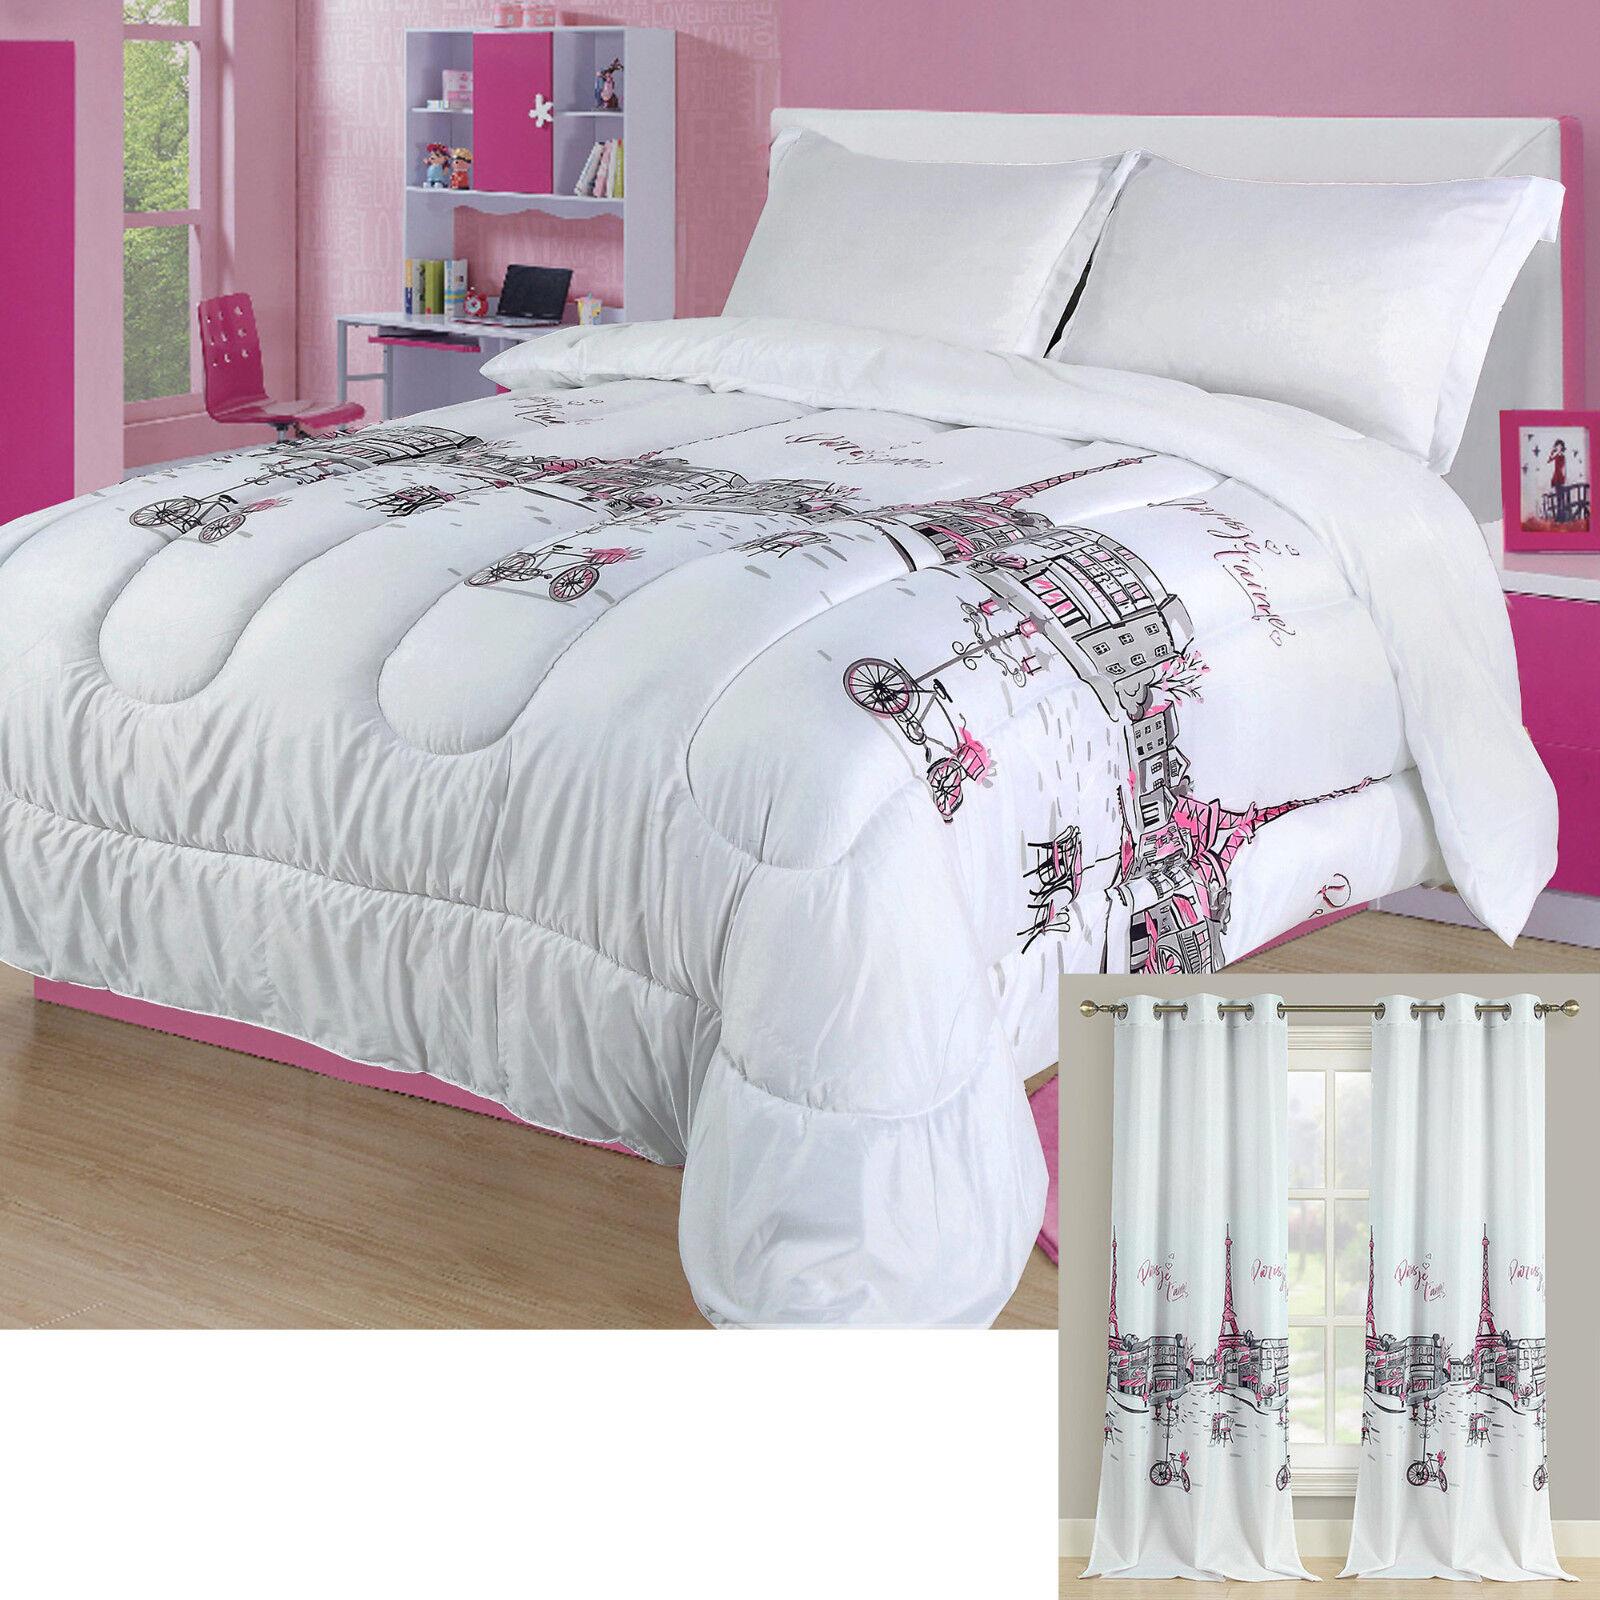 Twin, Full/Queen, or King Paris Comforter Bedding Set Pink Grey Eiffel Tower Bedding